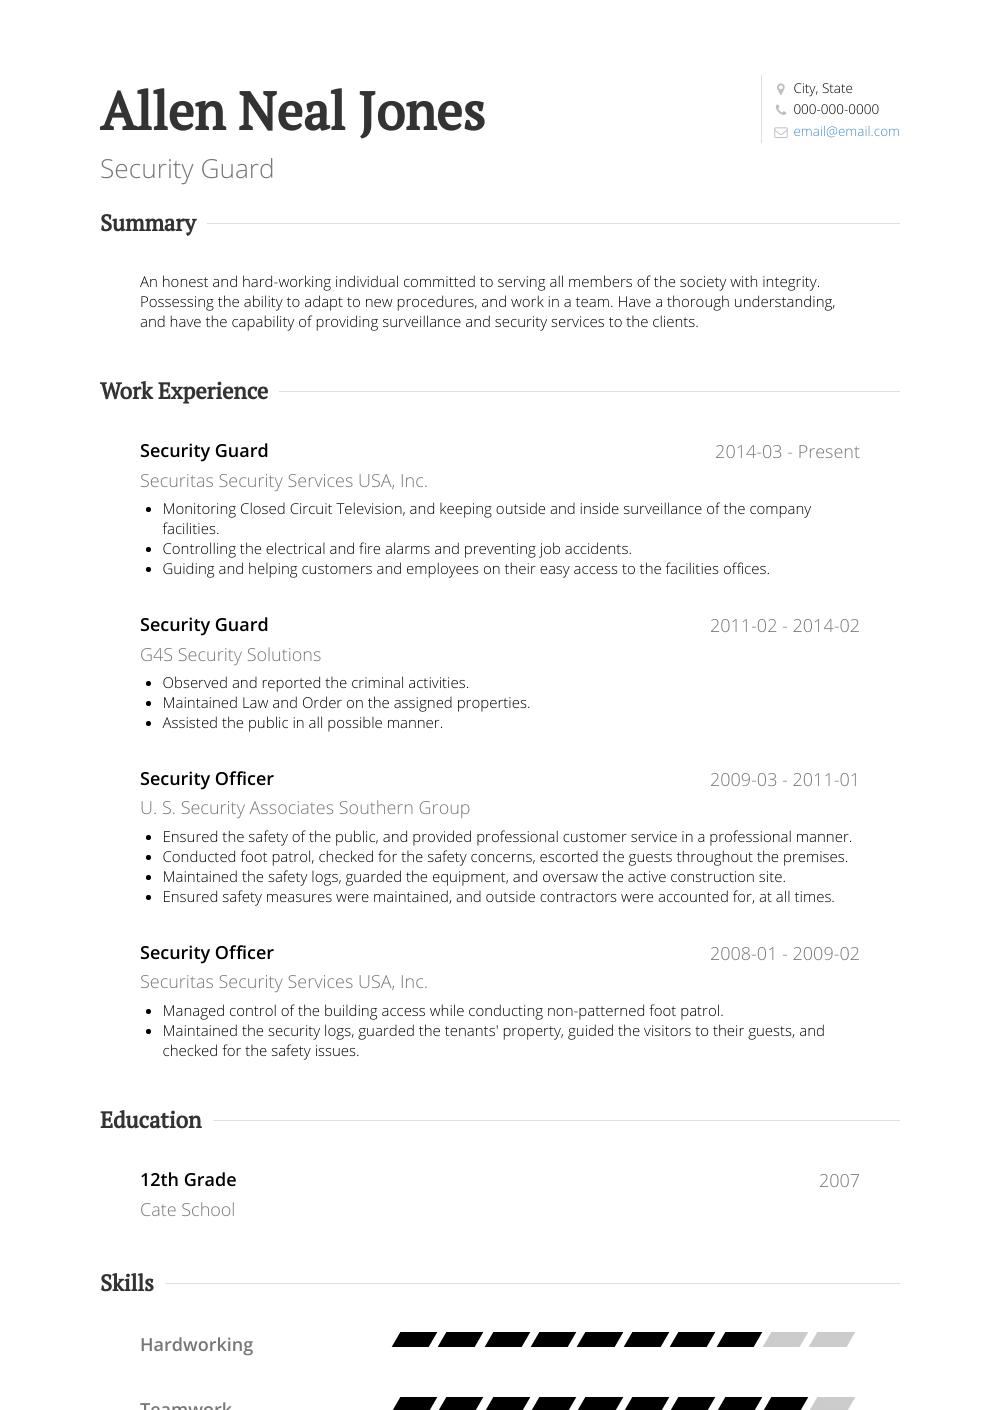 Security Guard Resume Samples & Templates VisualCV